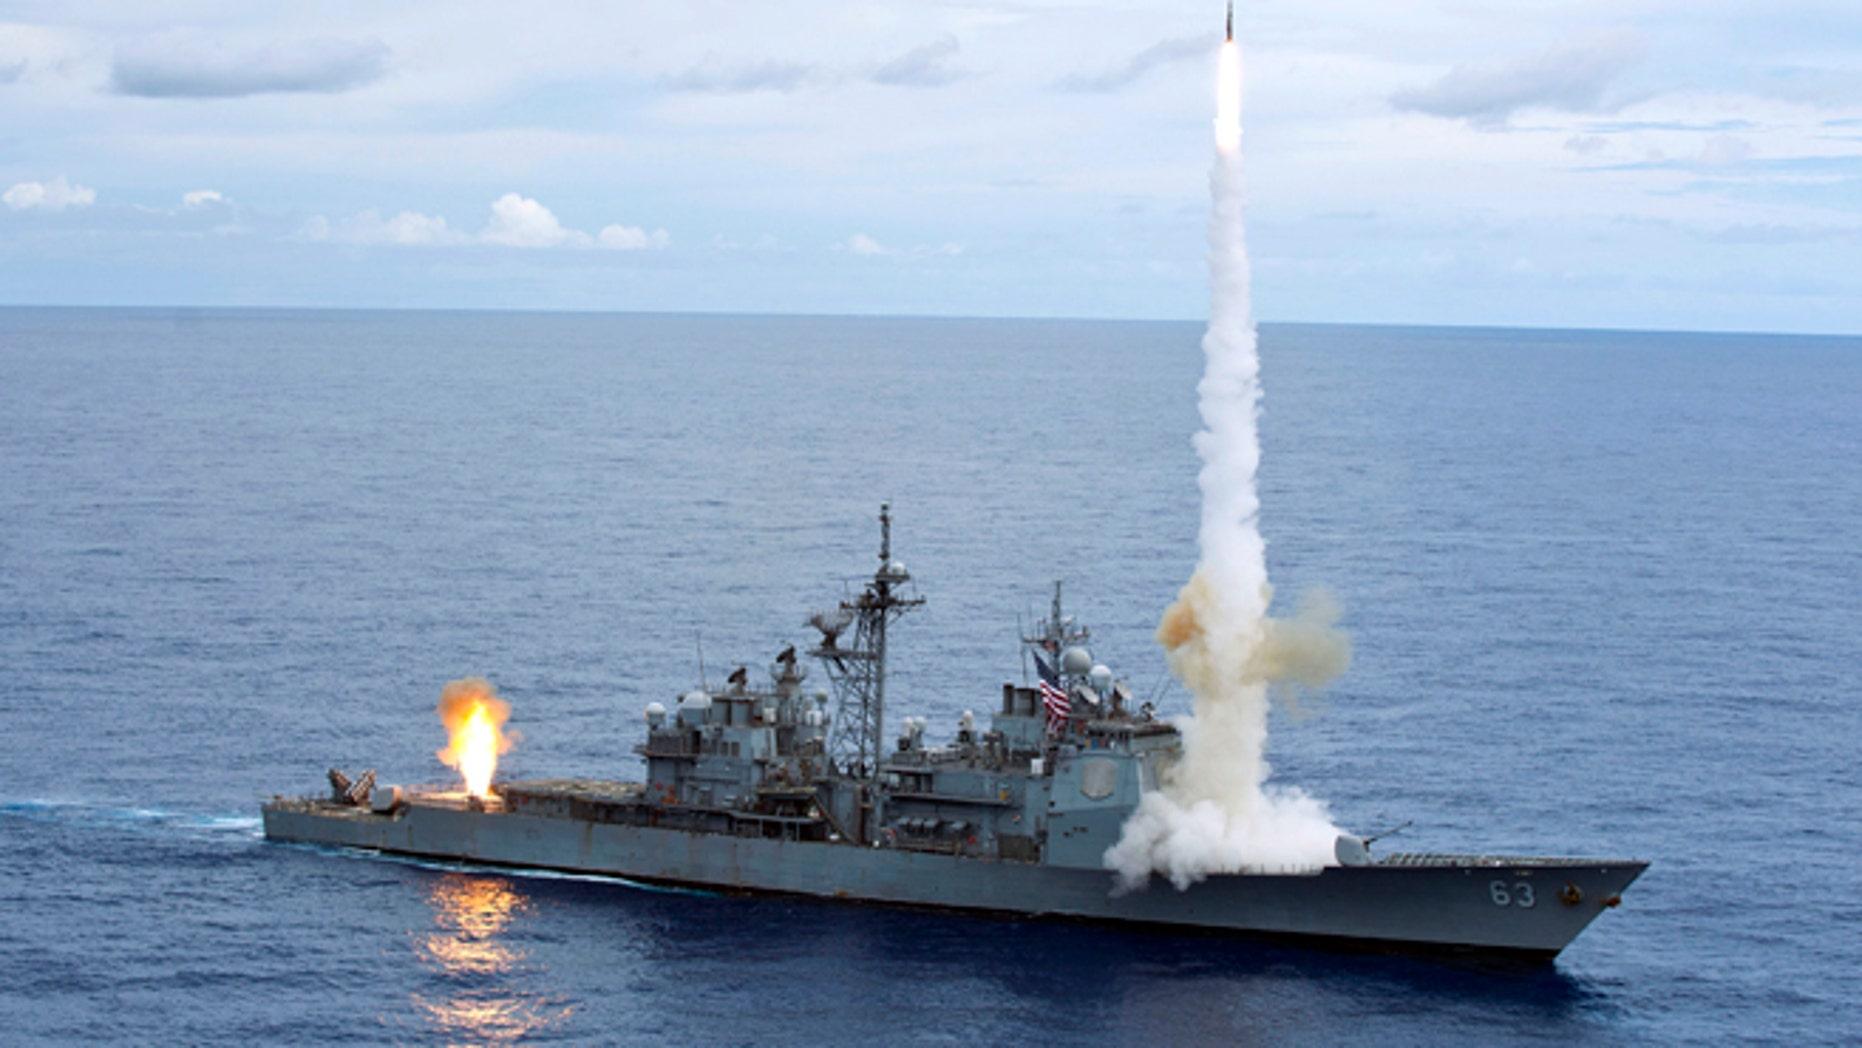 The Ticonderoga-class guided-missile cruiser USS Cowpens (CG 63).